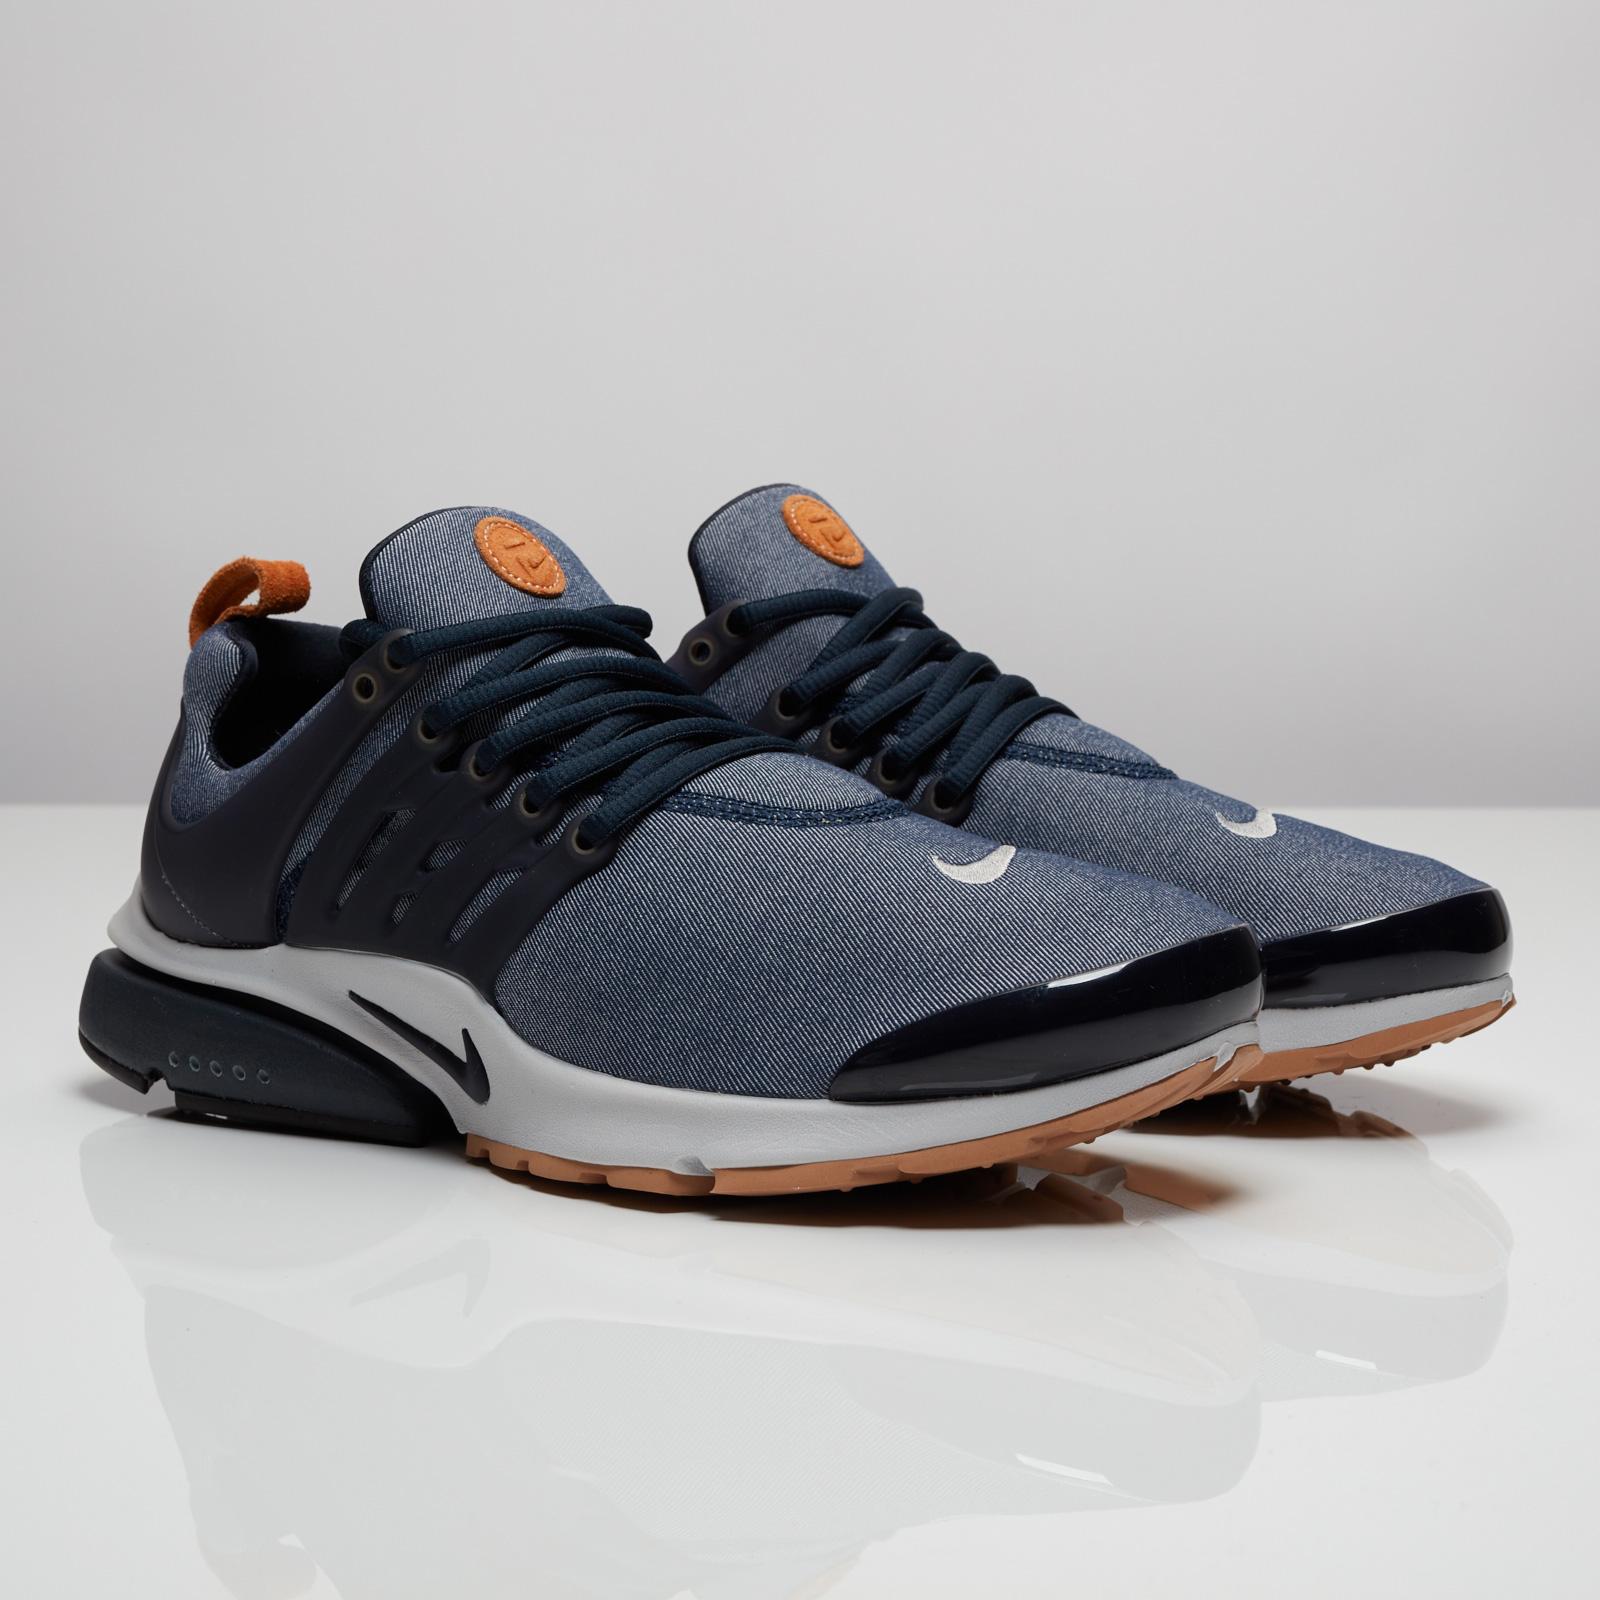 new product 6c03e c4342 Nike Air Presto Premium